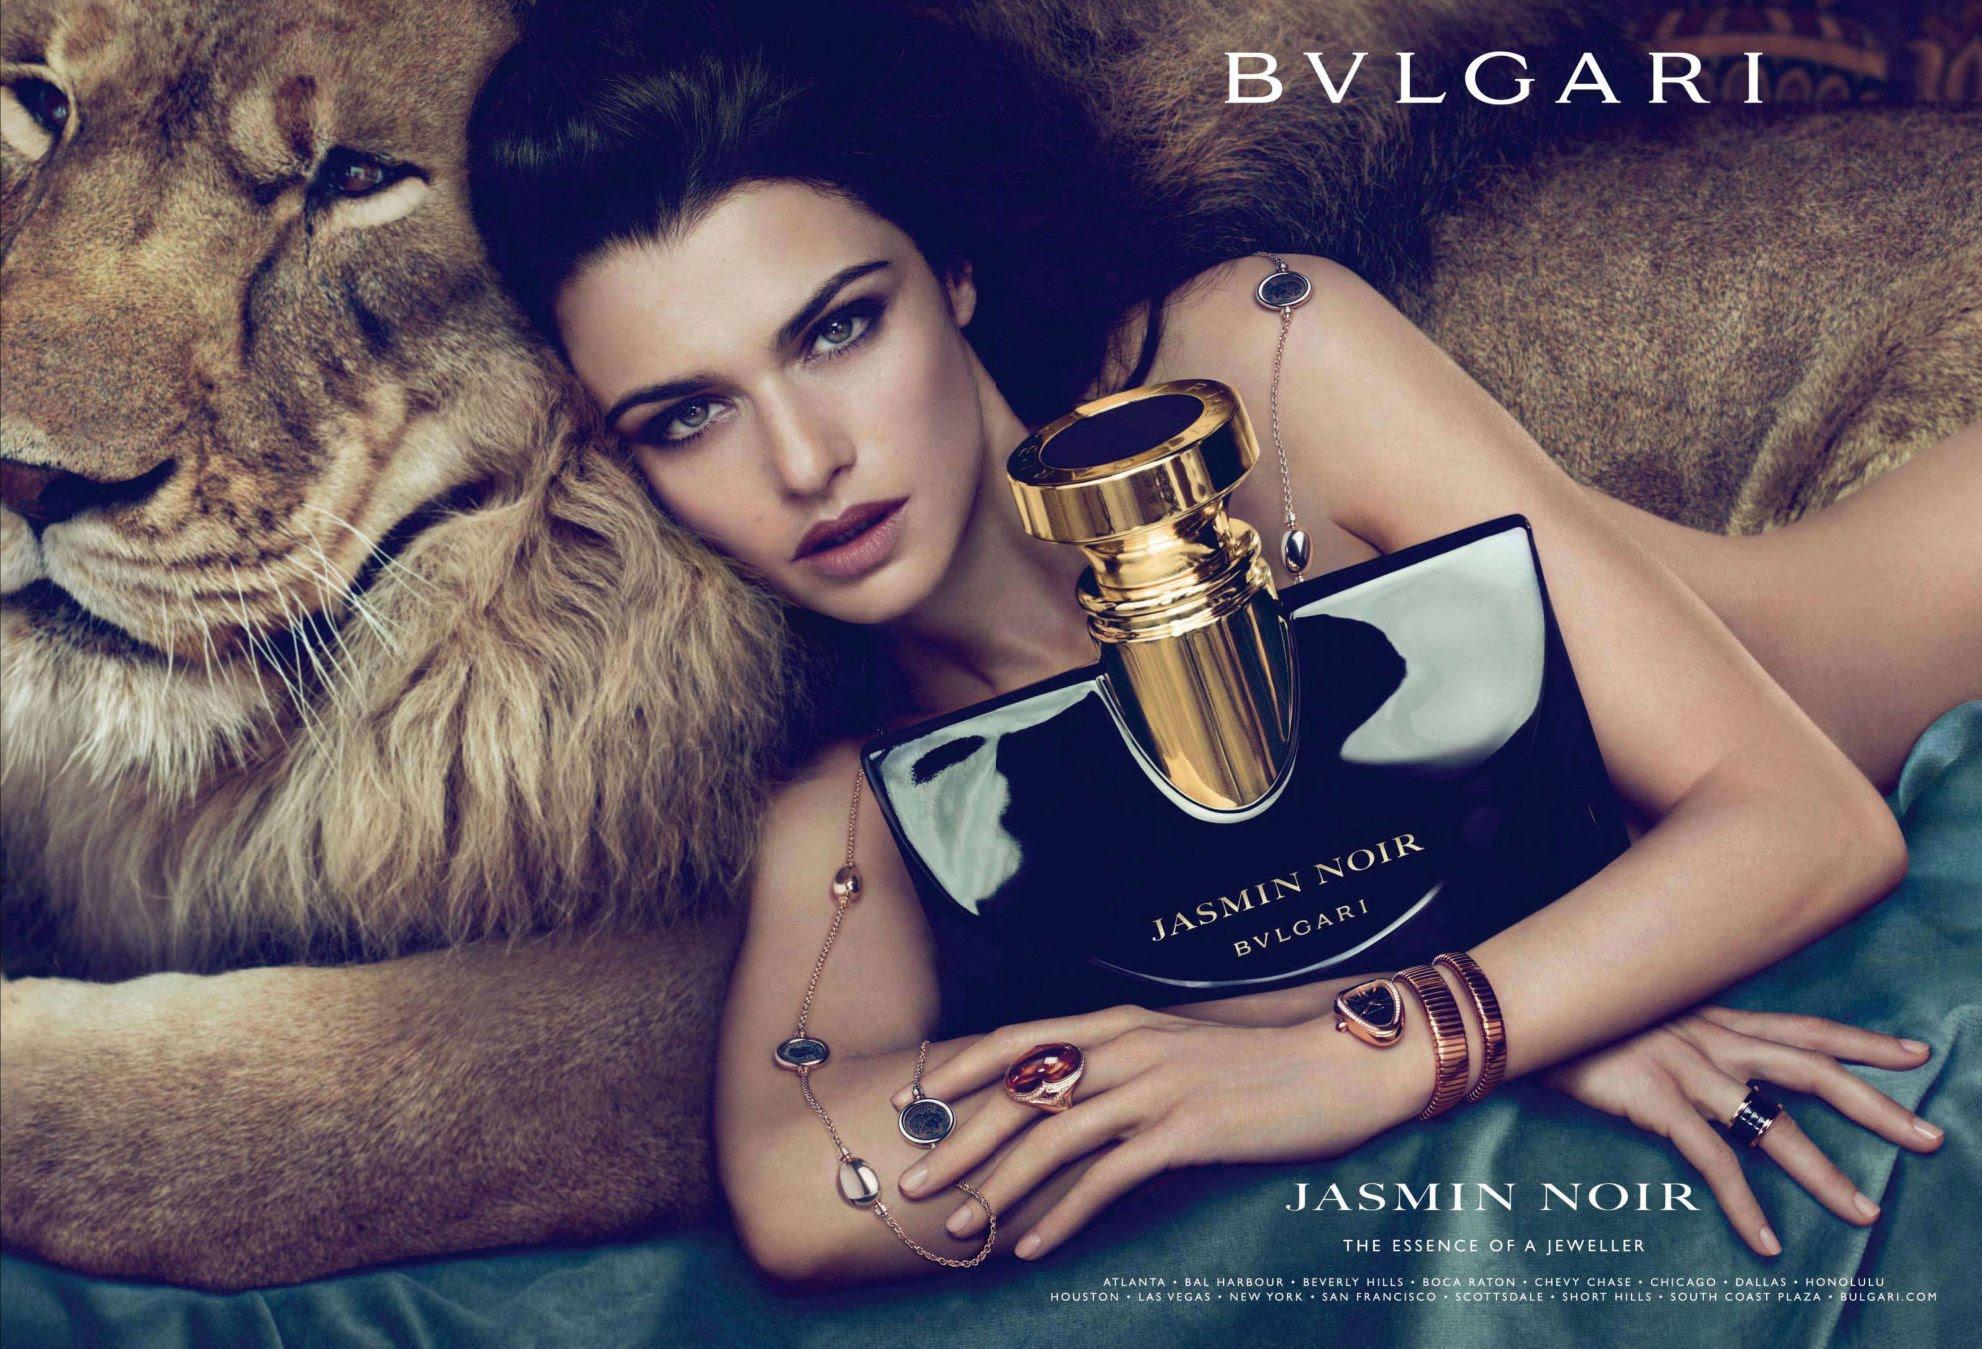 Bvlgari Jasmin Noir poster